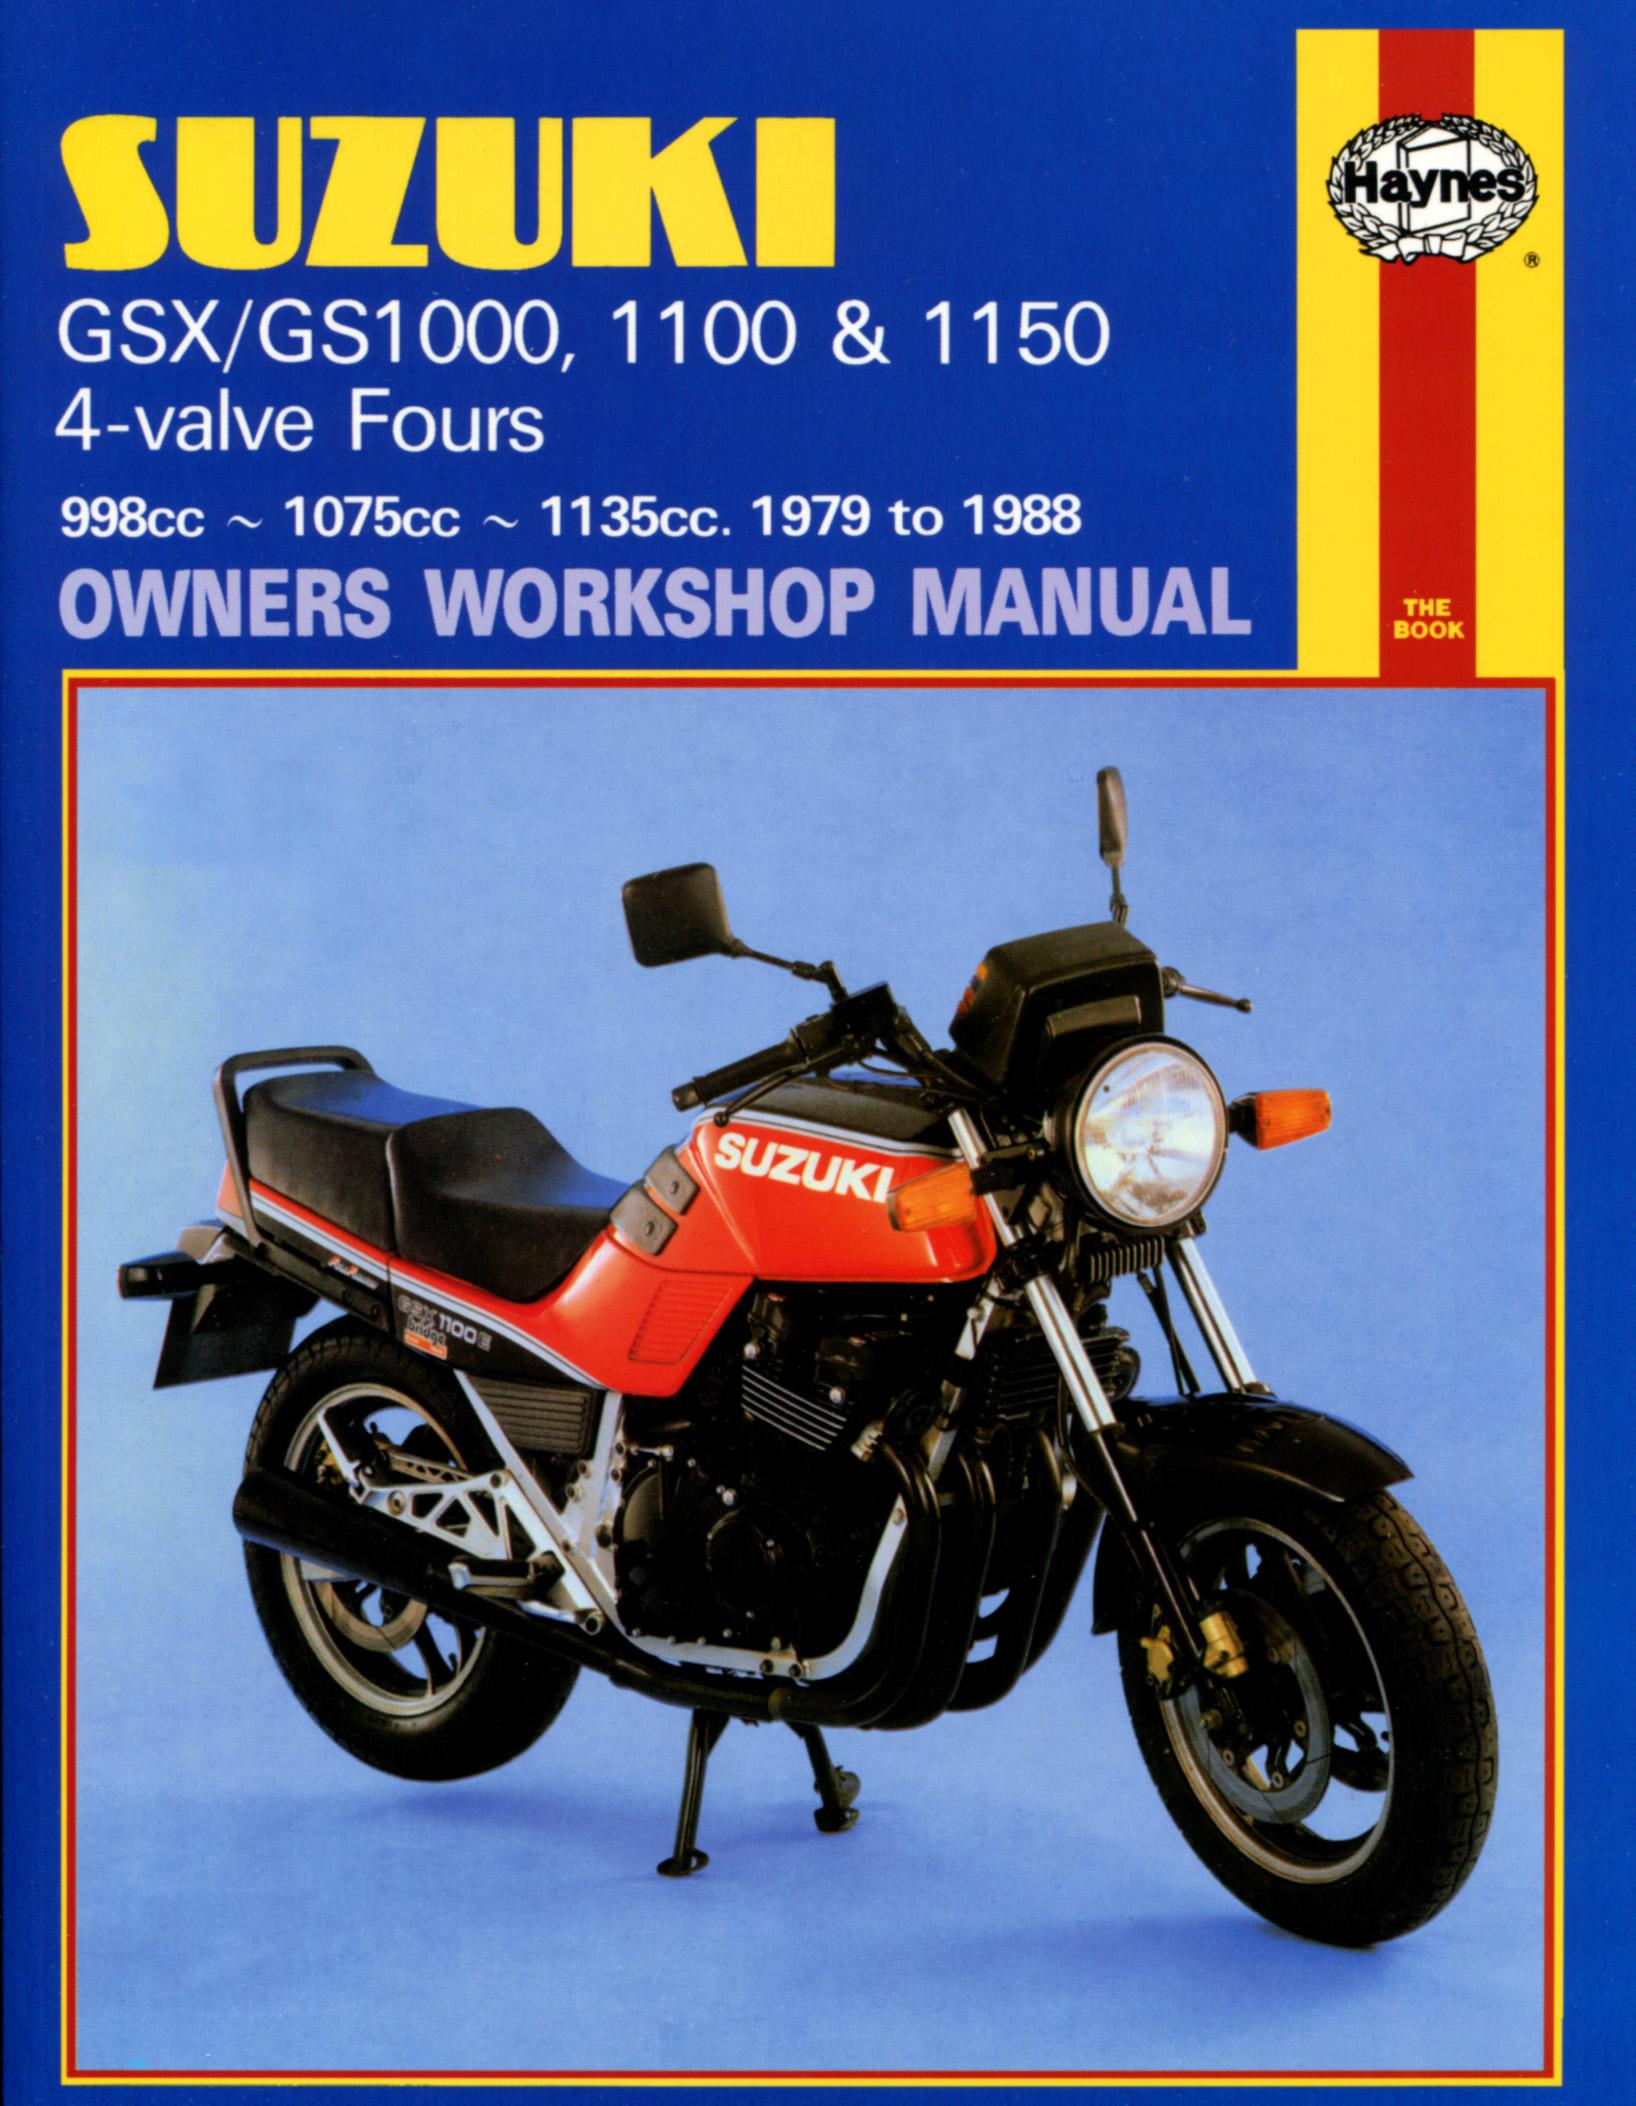 Suzuki GSX/GS1000, 1100 & 1150 4-valves (79-88) Haynes Repair Manual